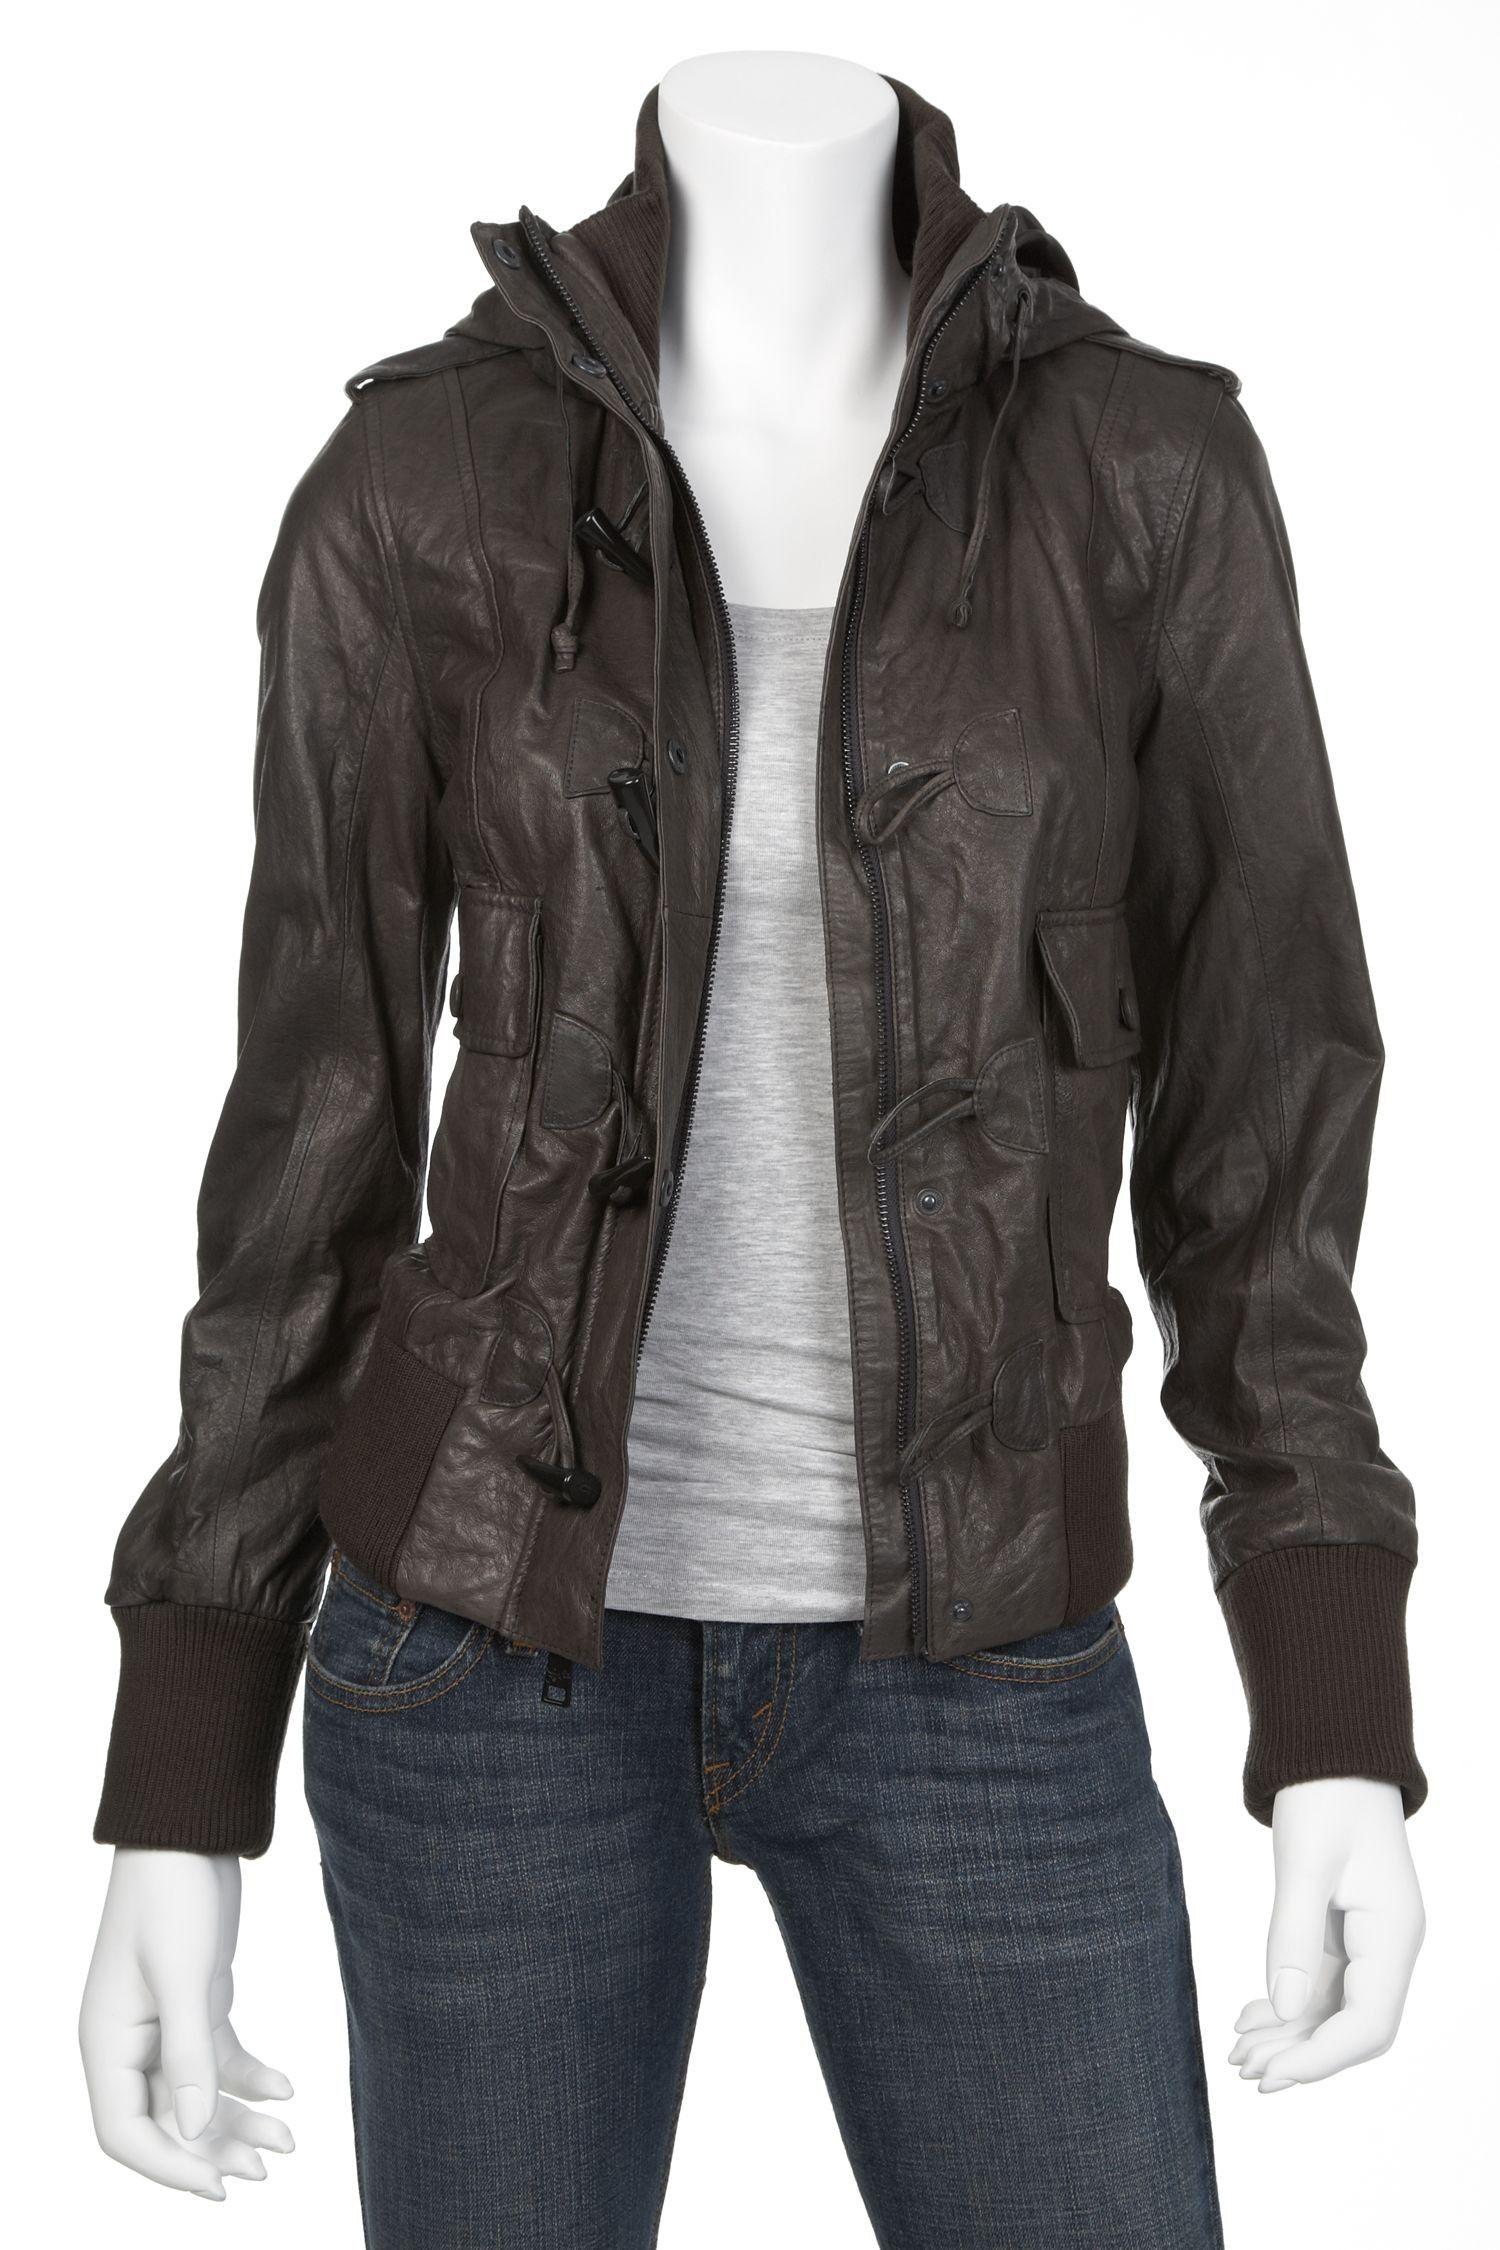 Levi's womens leather jacket Body Canvas Pinterest